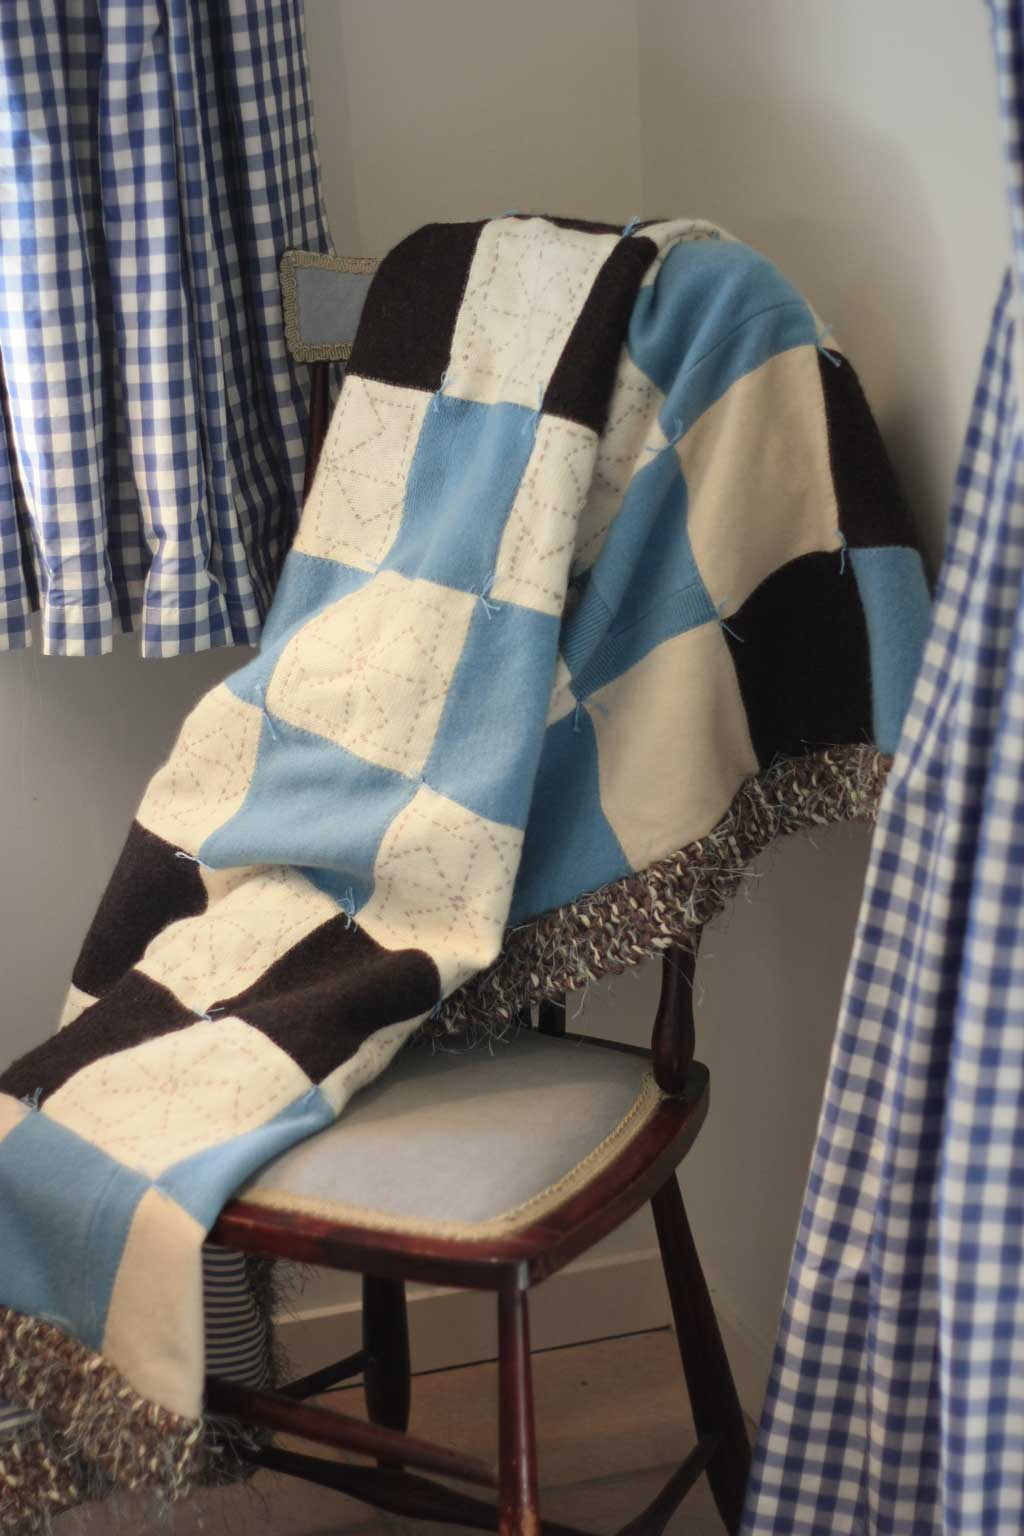 rug-on-chair_9070